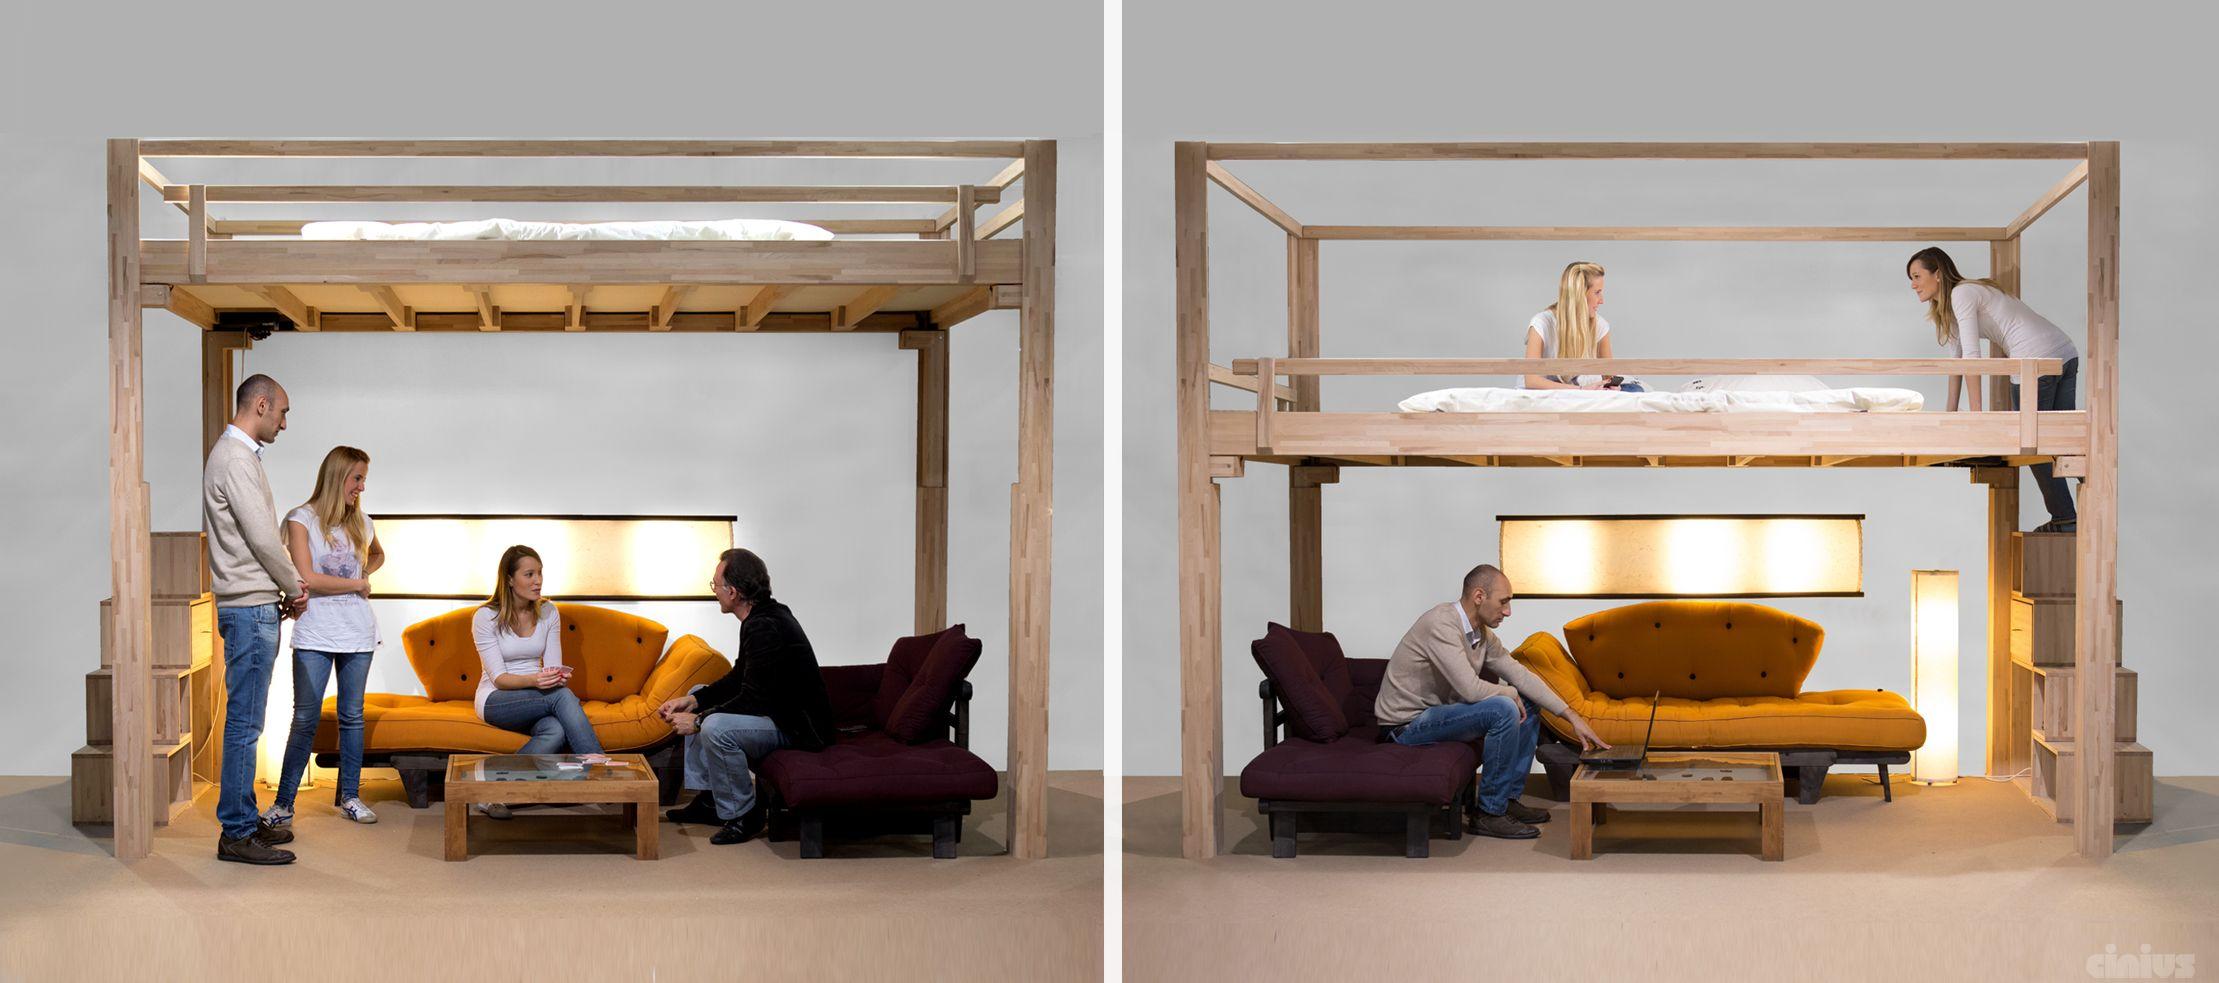 Cama alta de madera RISING by Cinius | Mini casas | Pinterest ...